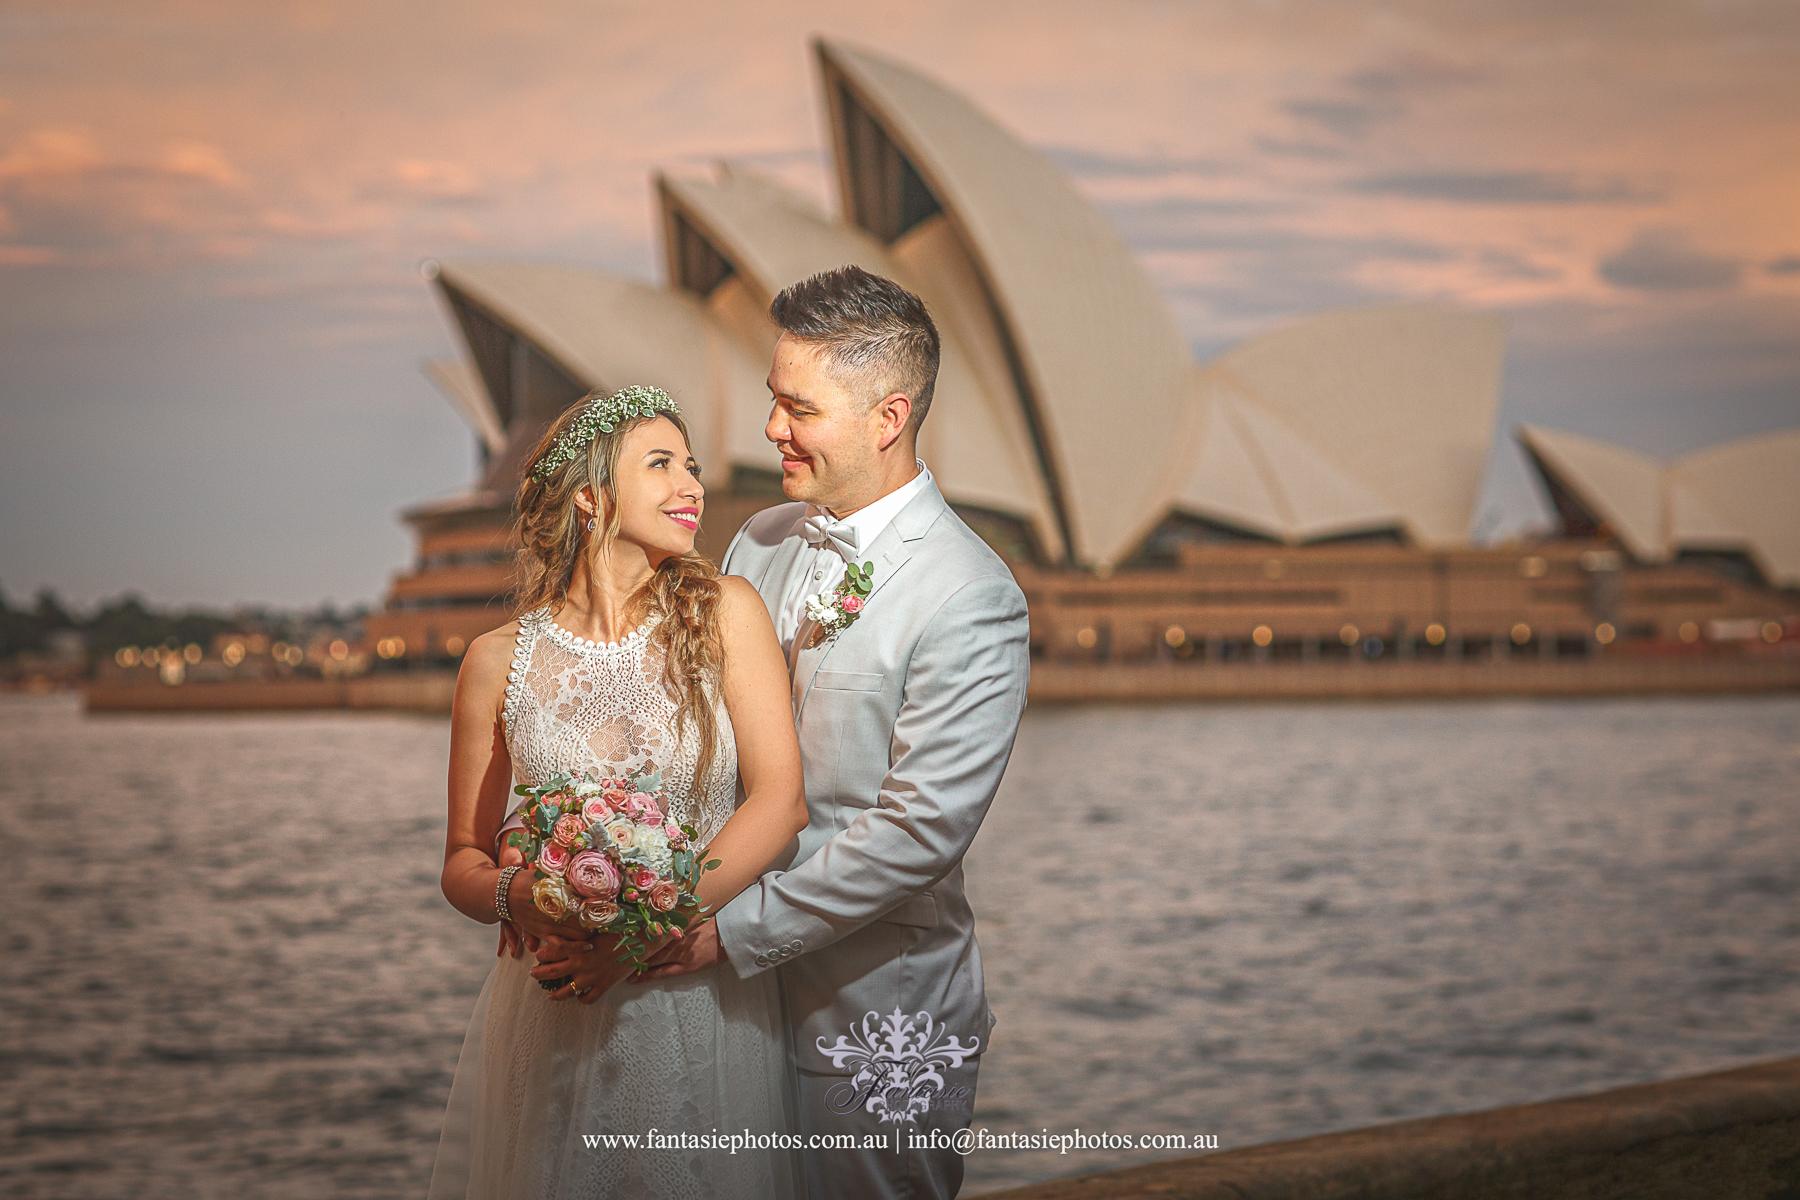 Wedding Photography The Rocks Sydney | Fantasie Photography